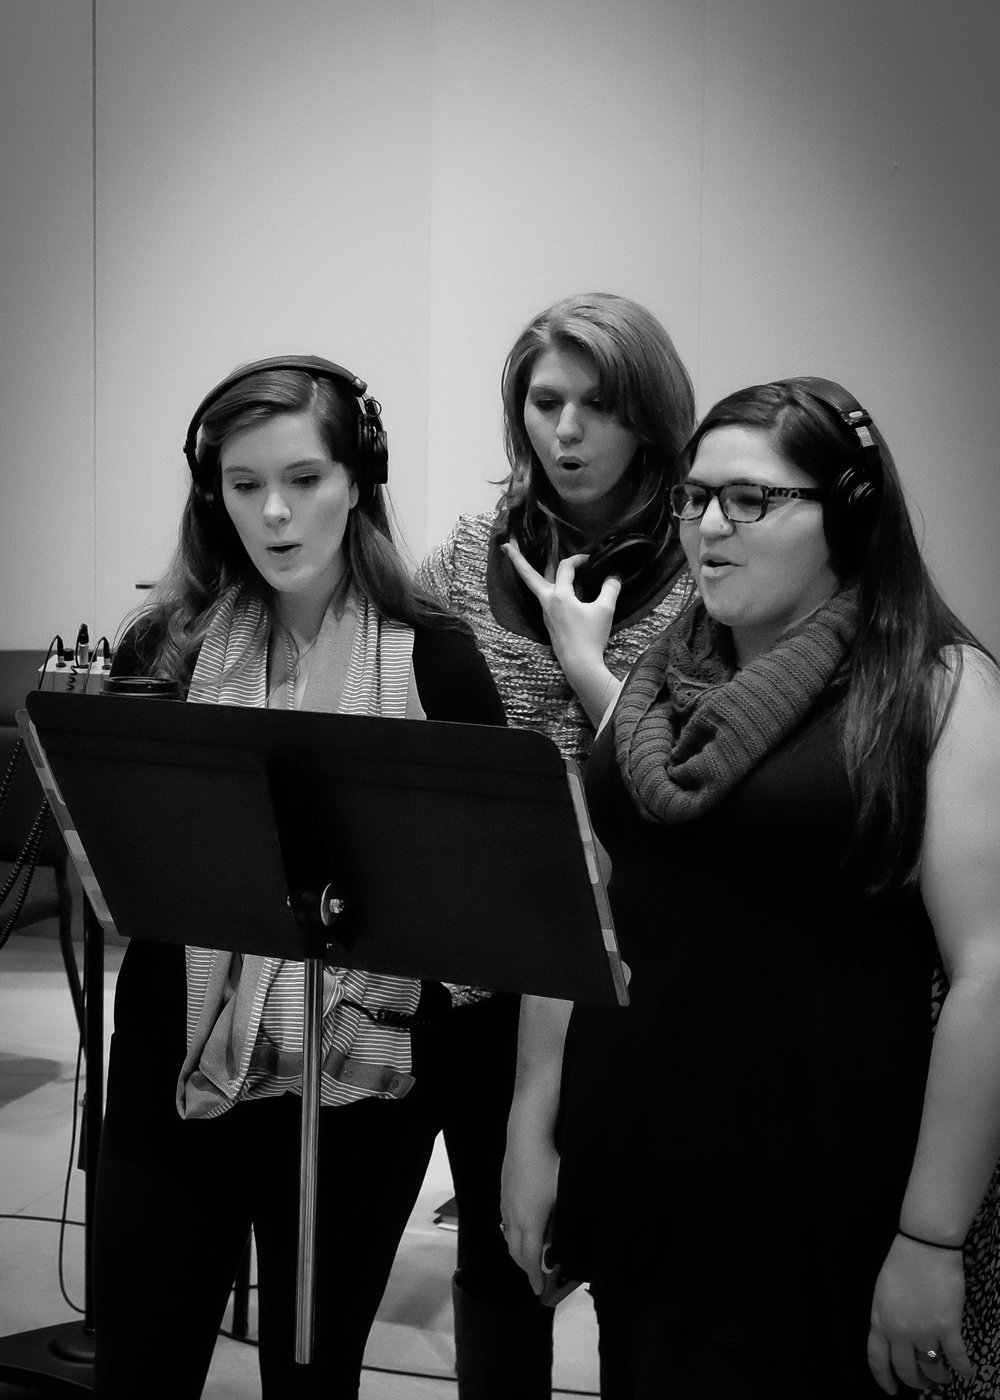 Recording a Studio Album of  Music Is  at Western Carolina University.